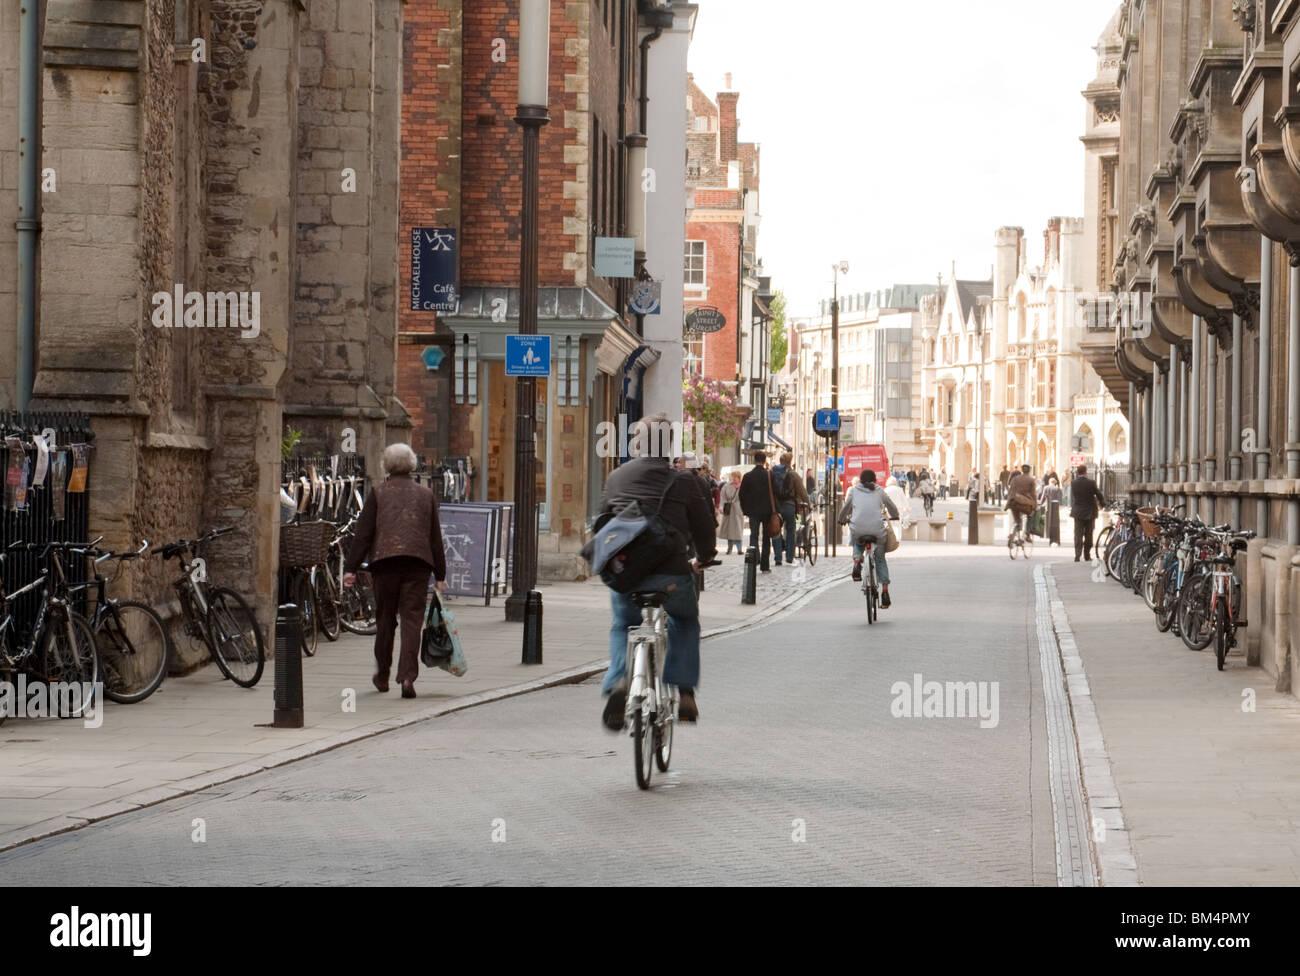 Street scene, Trinity Street, Cambridge UK - Stock Image